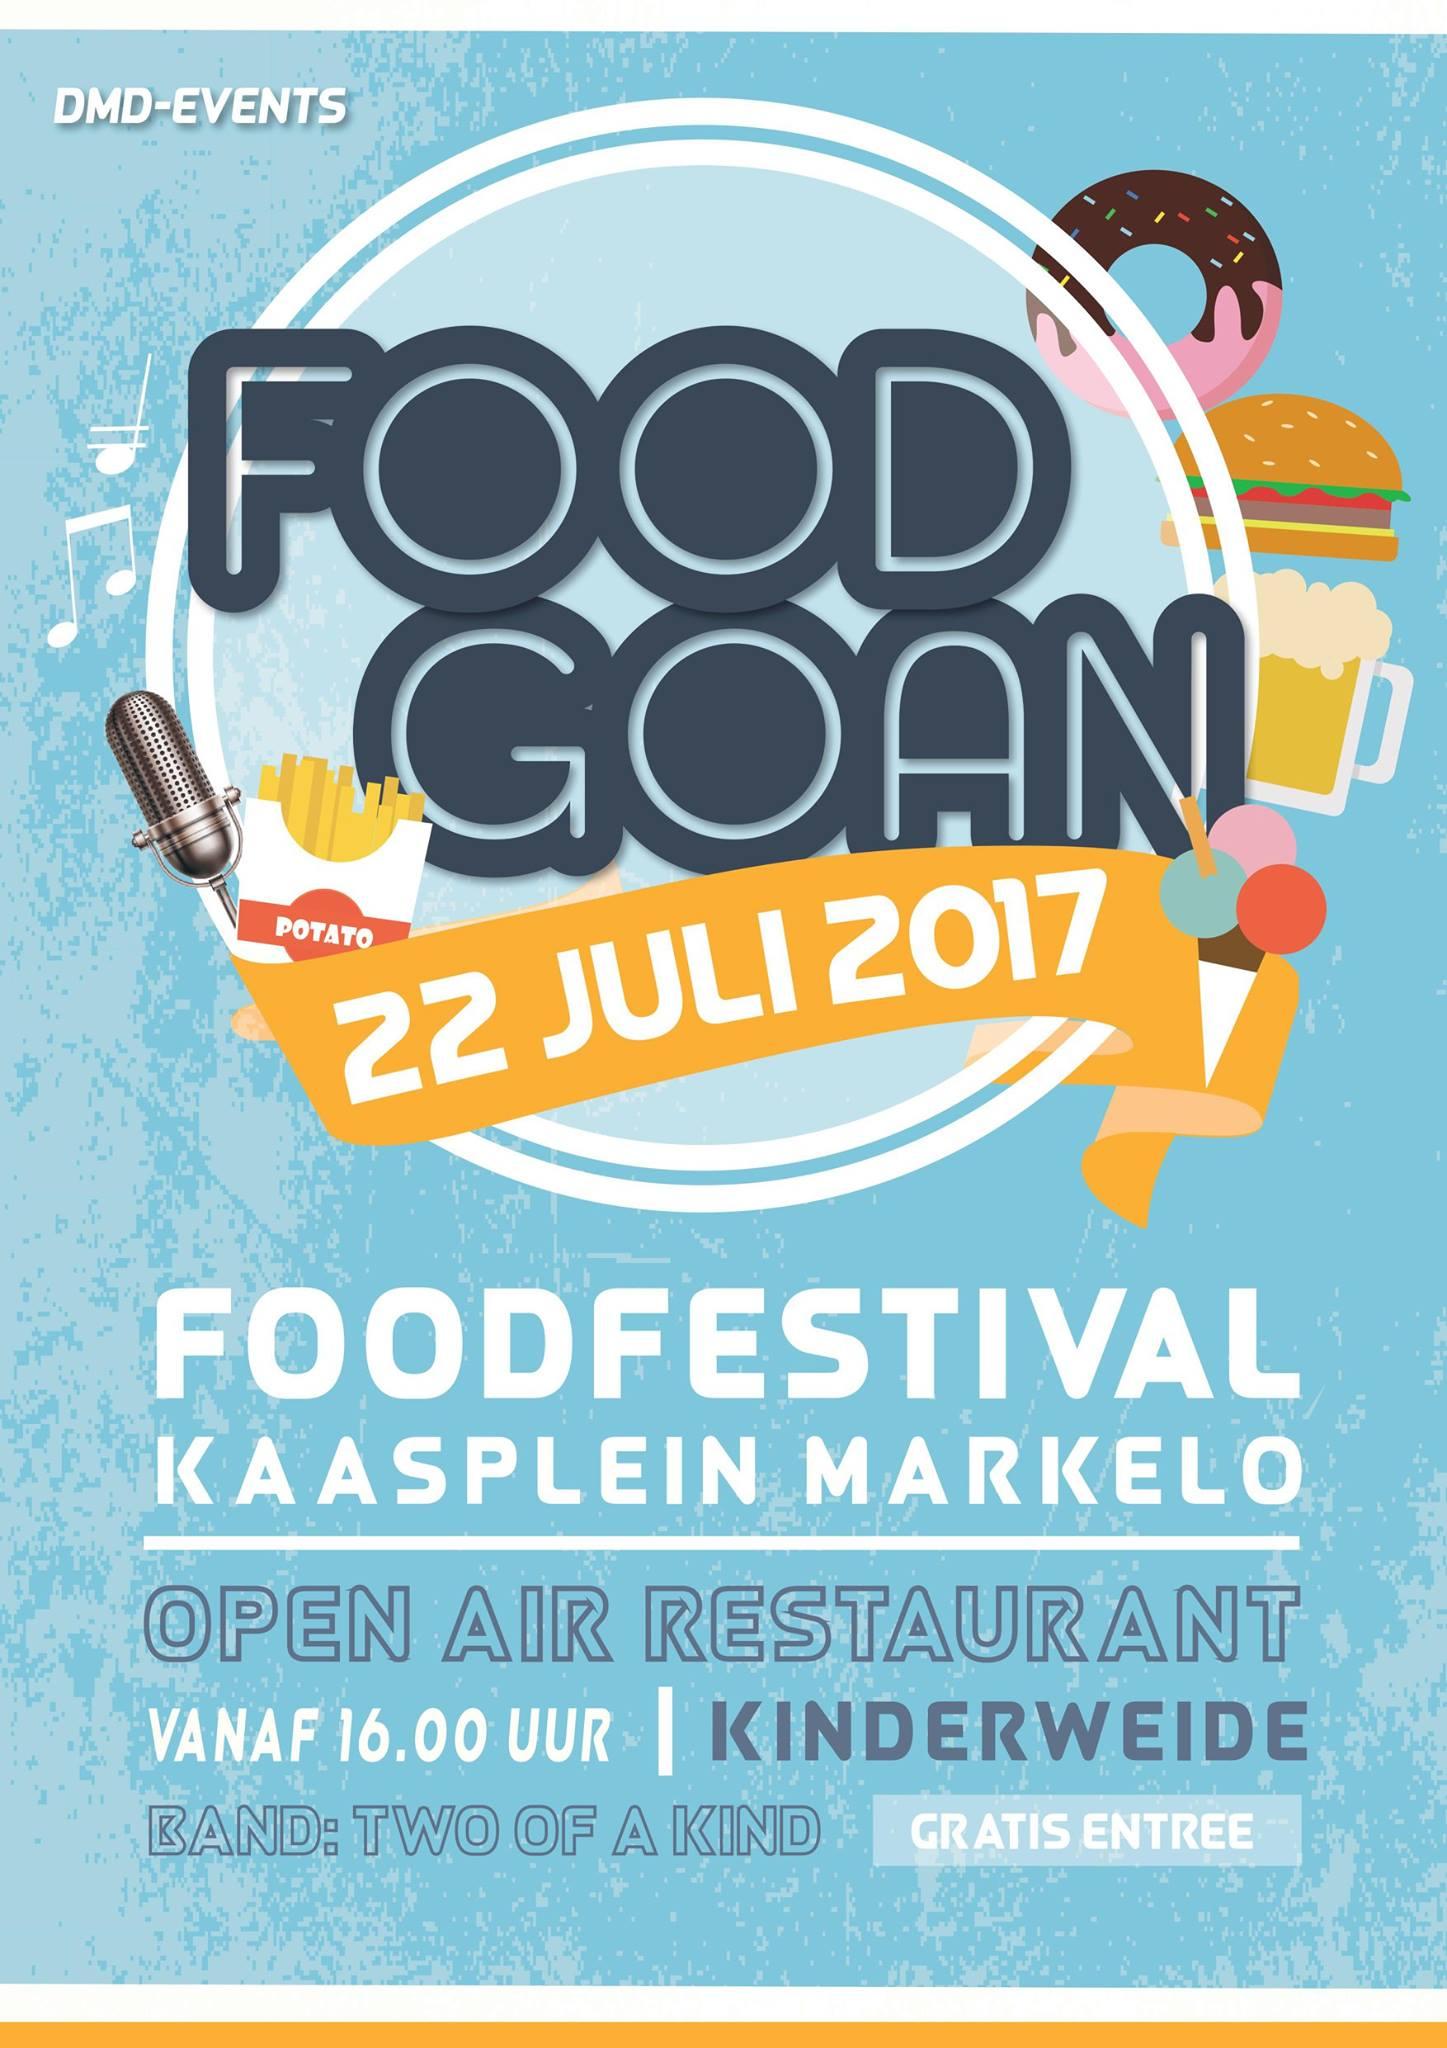 foodgoan-festival-dmd-events-markelo-kaasfabriek